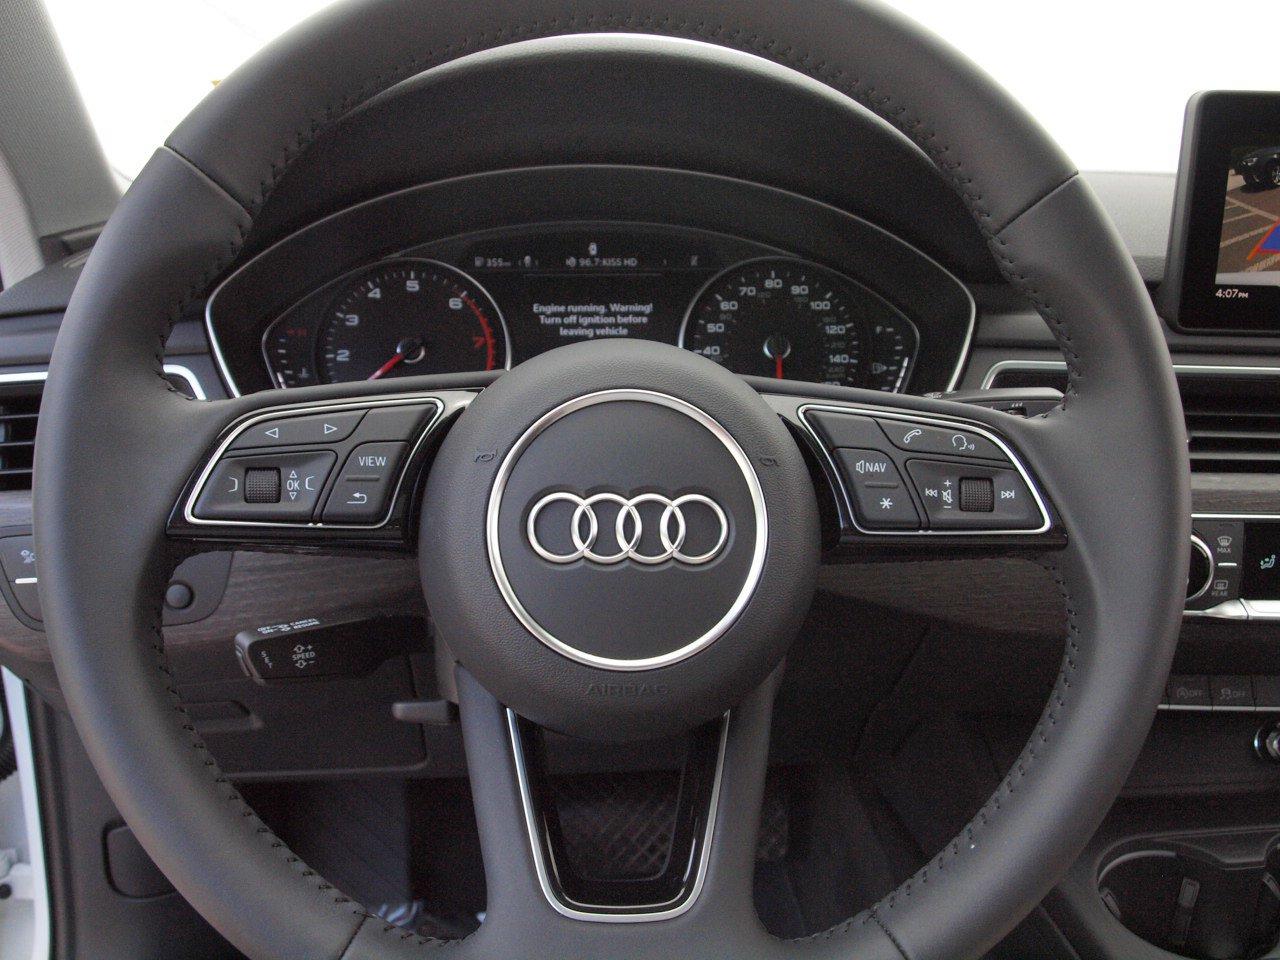 Certified Pre-Owned 2019 Audi A4 Titanium Premium